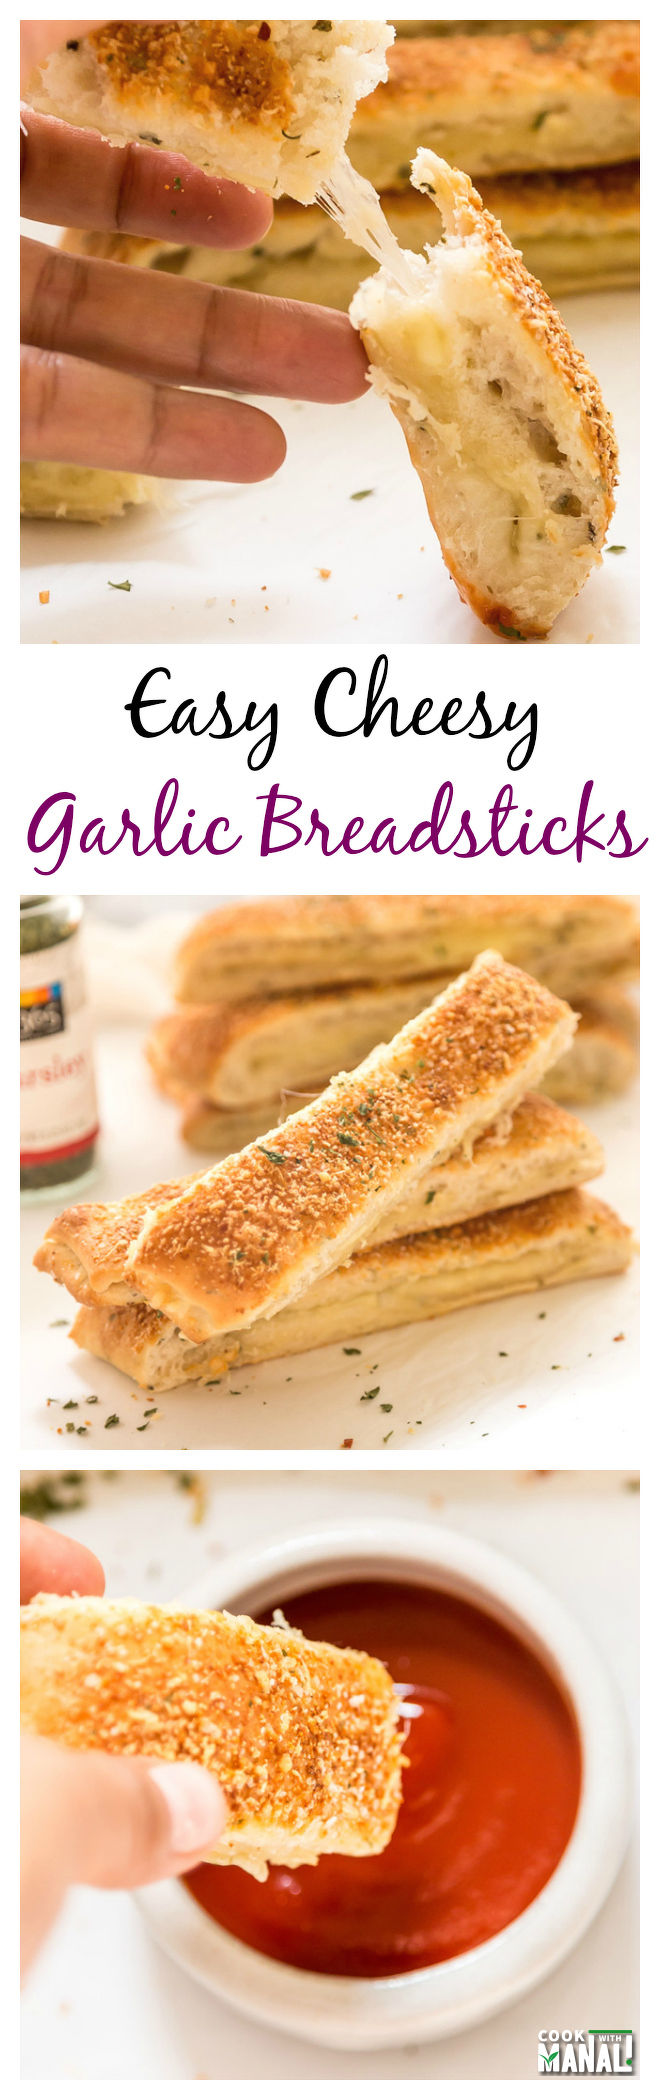 Easy Cheesy Garlic Bread Sticks Collage